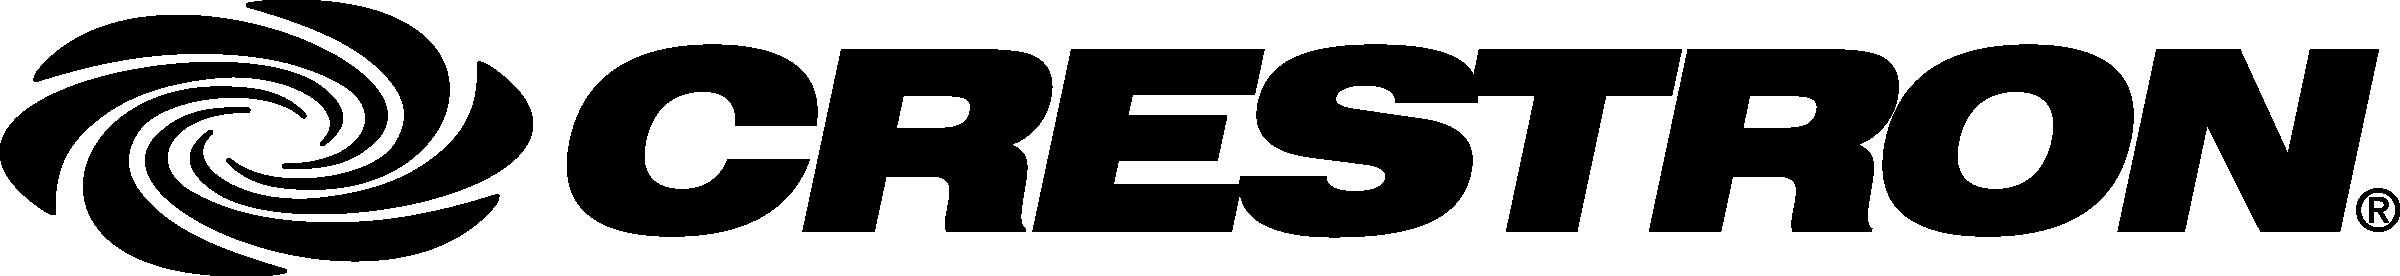 crestron_logo_black